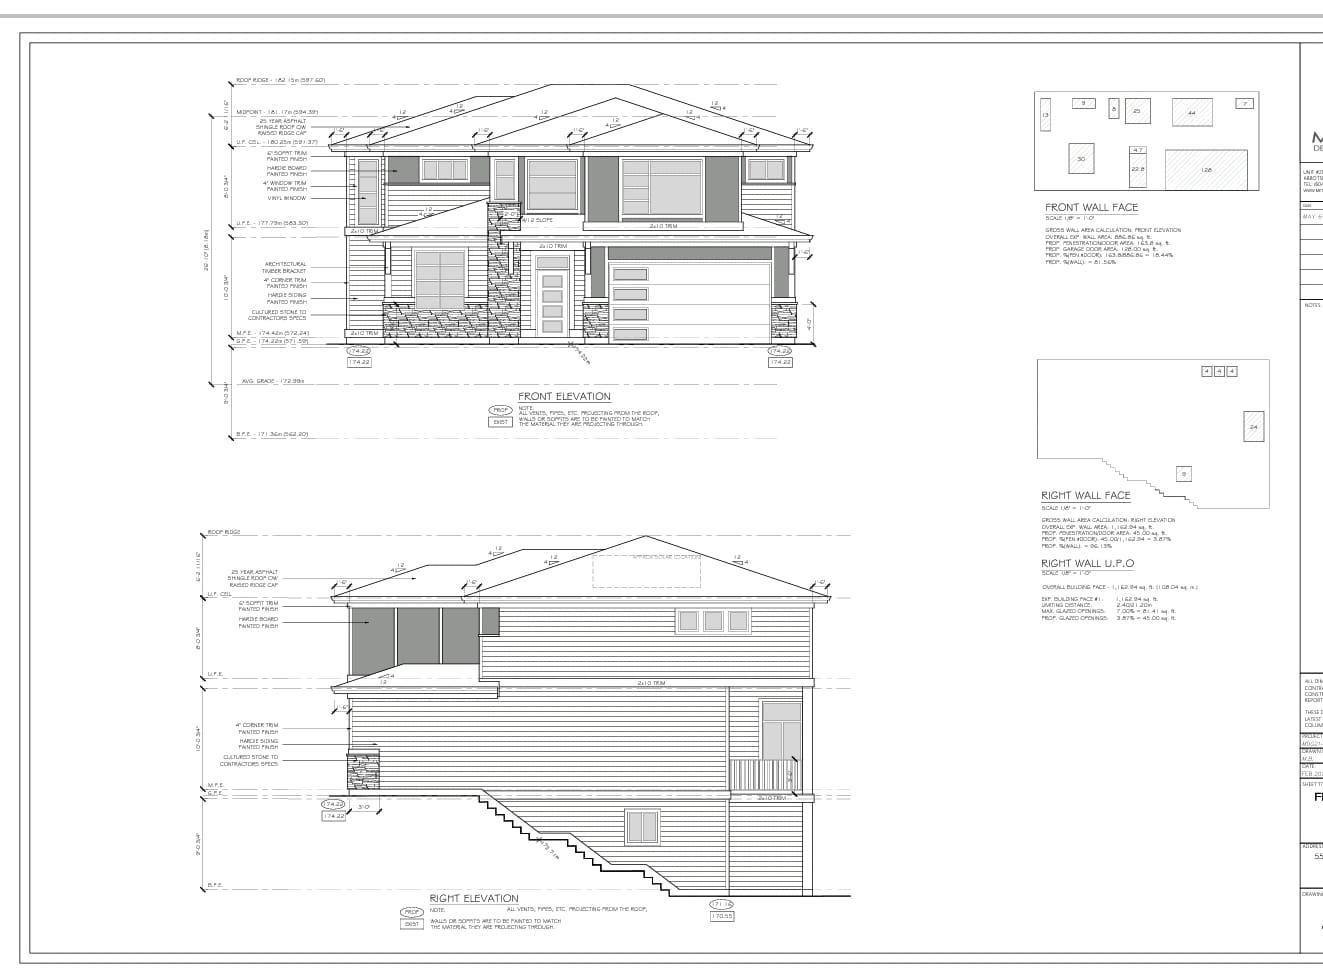 Main Photo: 5590 CRIMSON Ridge in Chilliwack: Promontory House for sale (Sardis)  : MLS®# R2611536